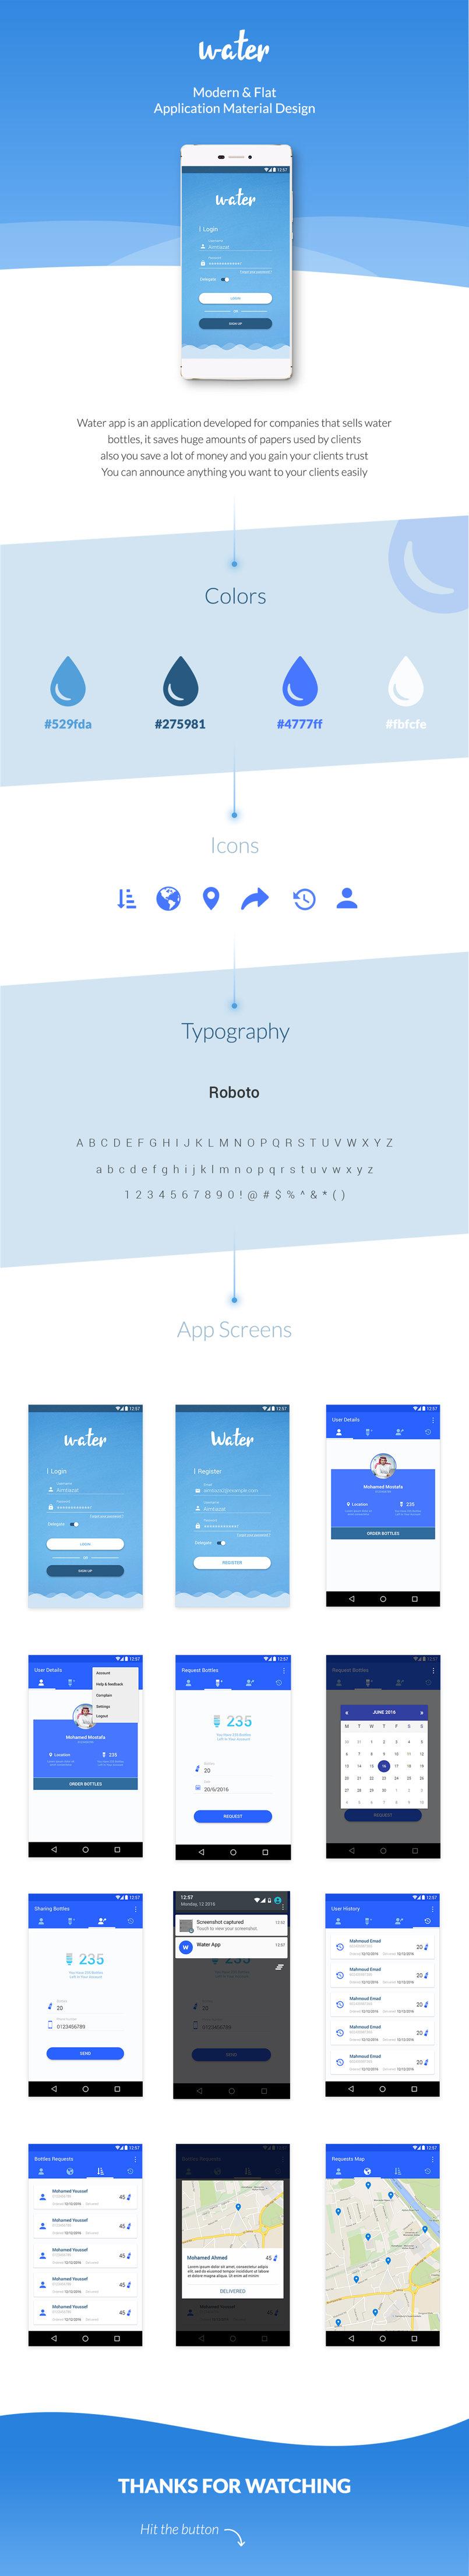 Water App - Mobile App Design